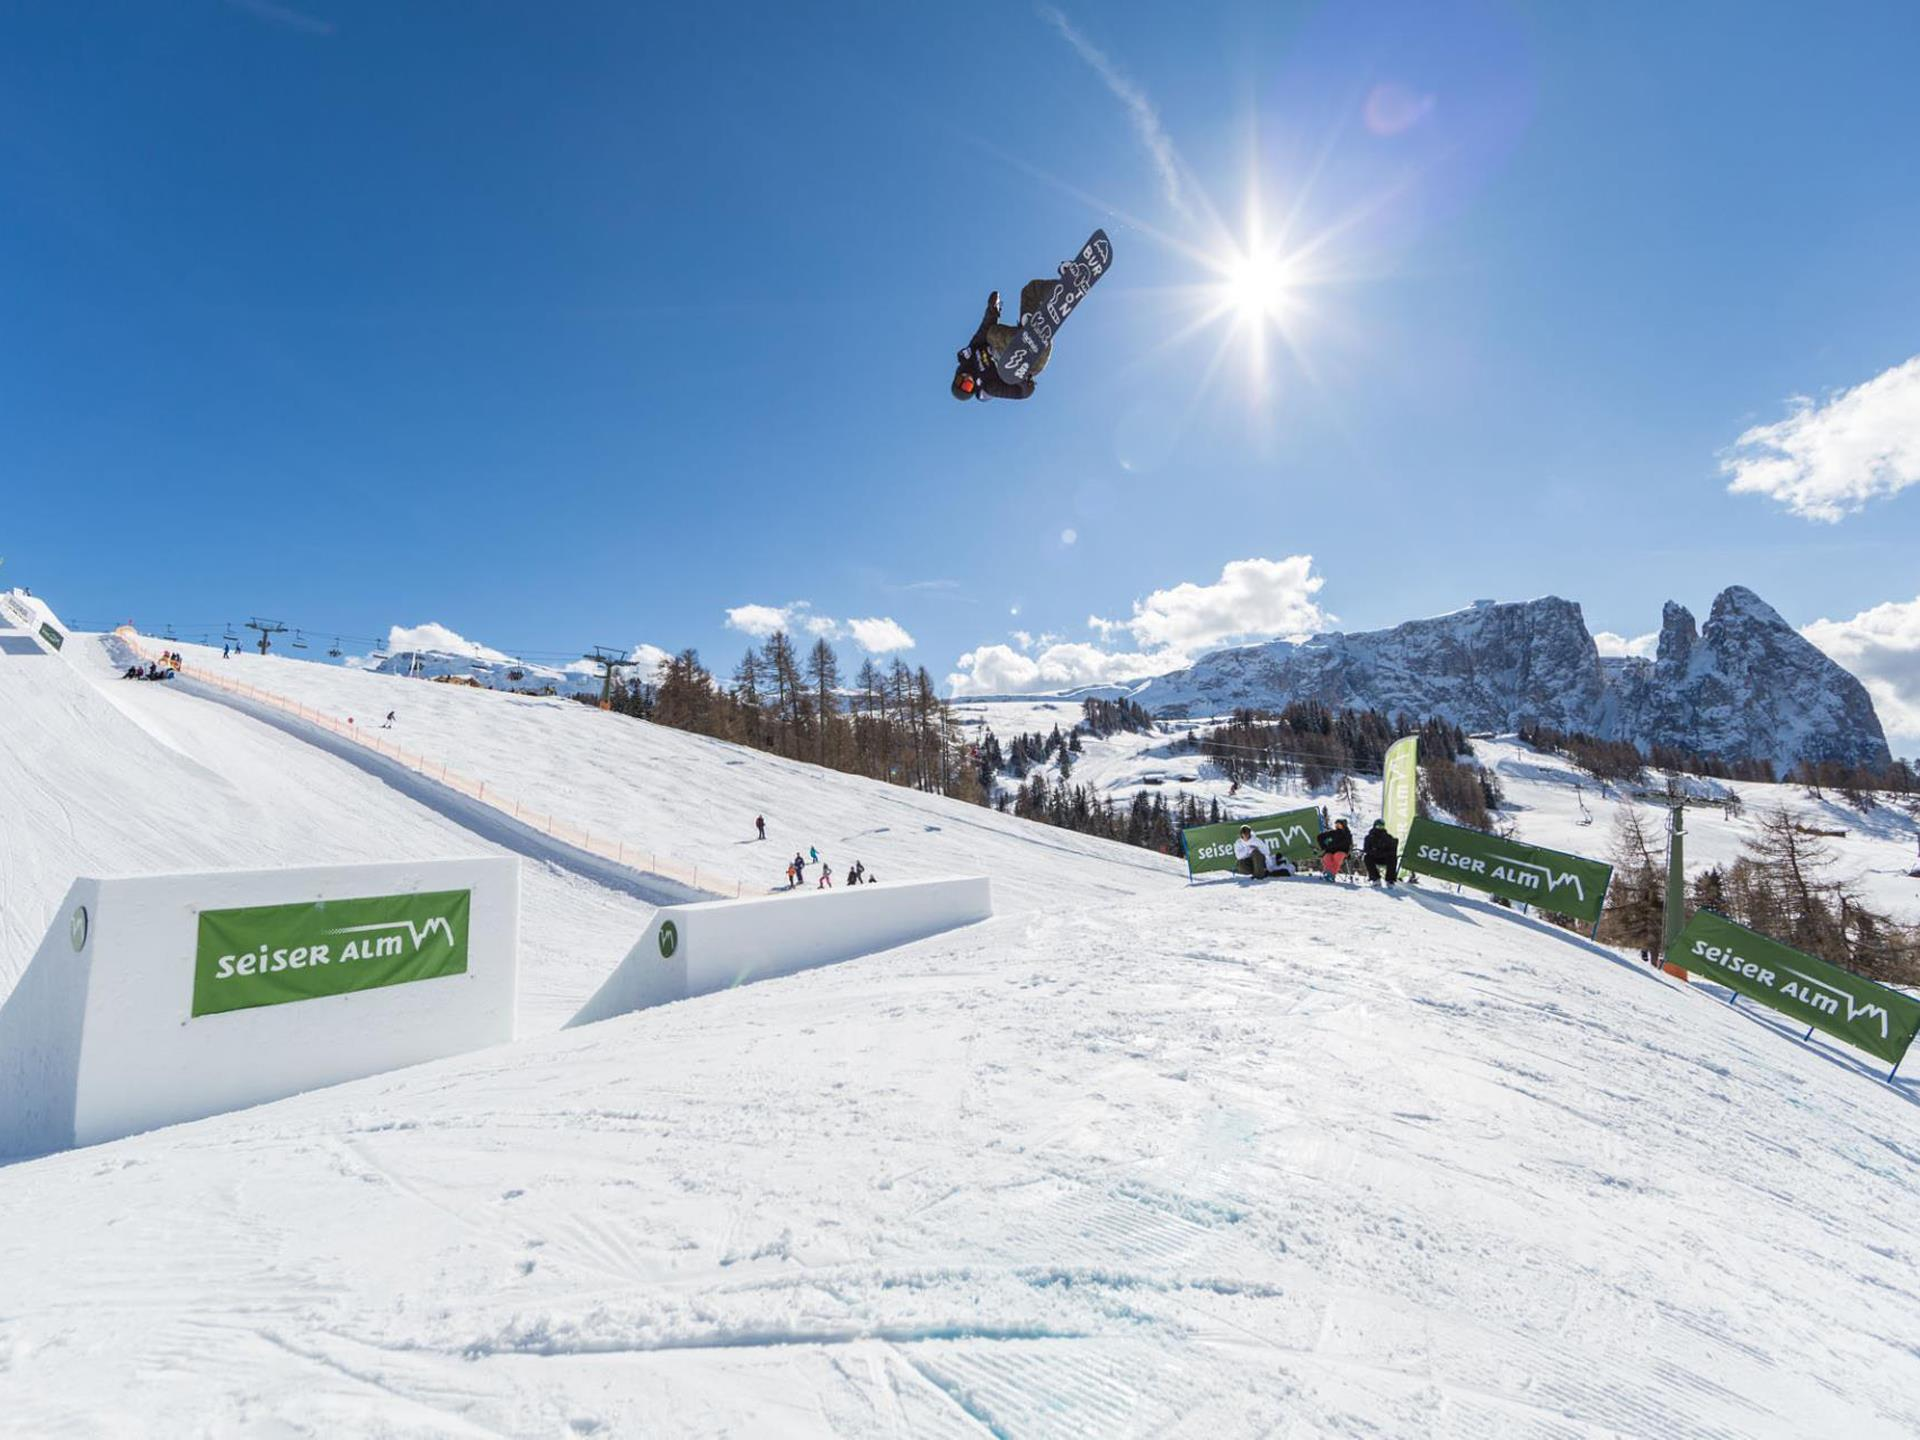 FIS Weltcup Slopestyle Snowboard & Freeski